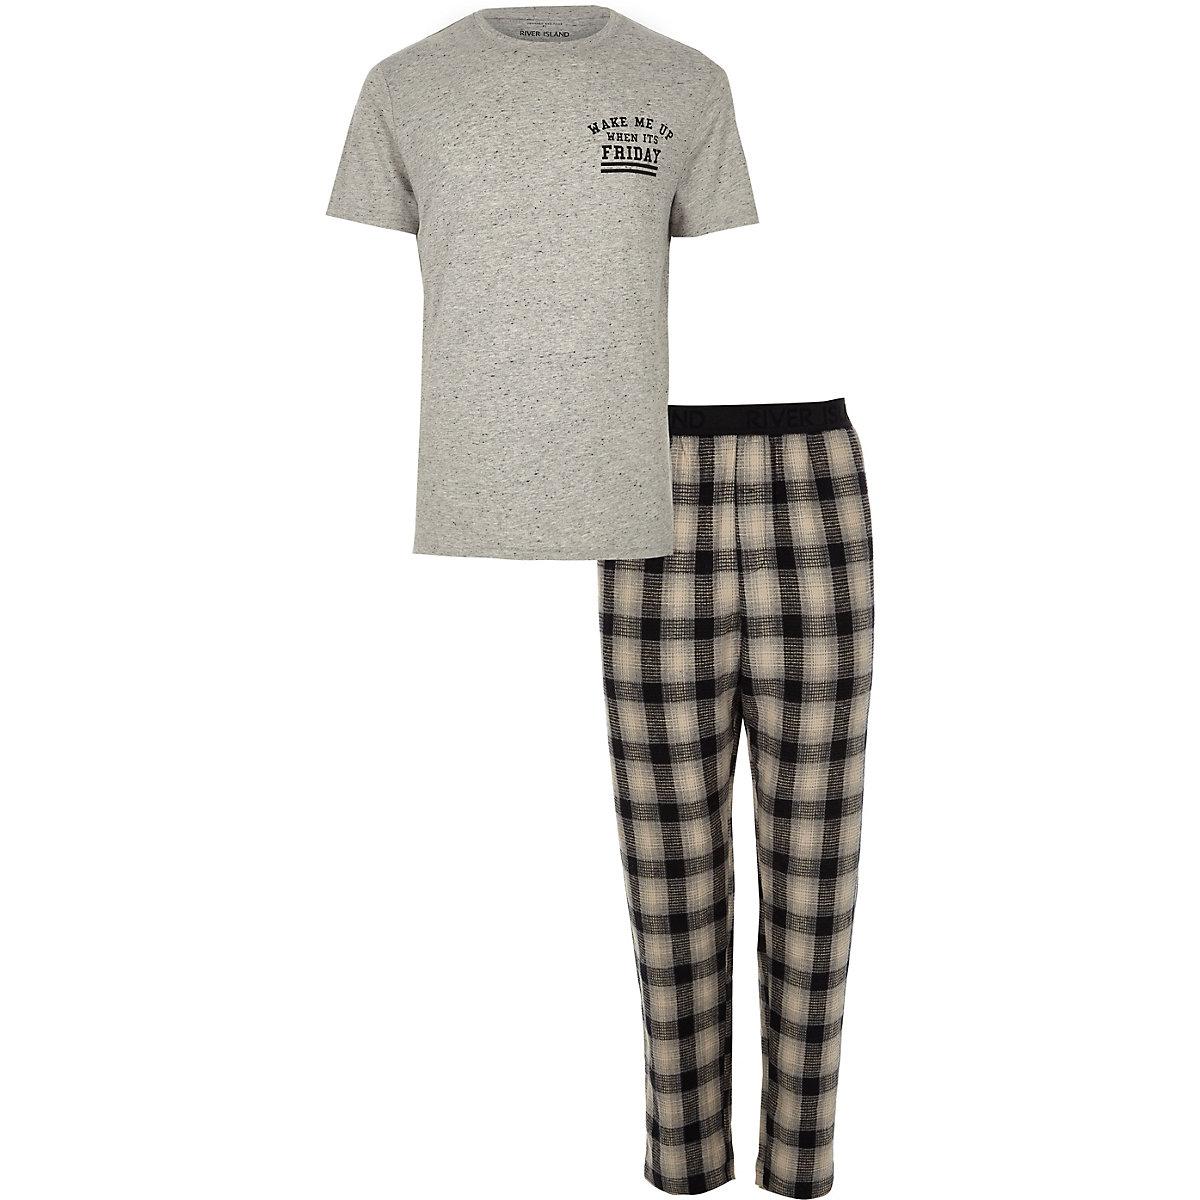 Grey 'wake me up' print check pyjama set